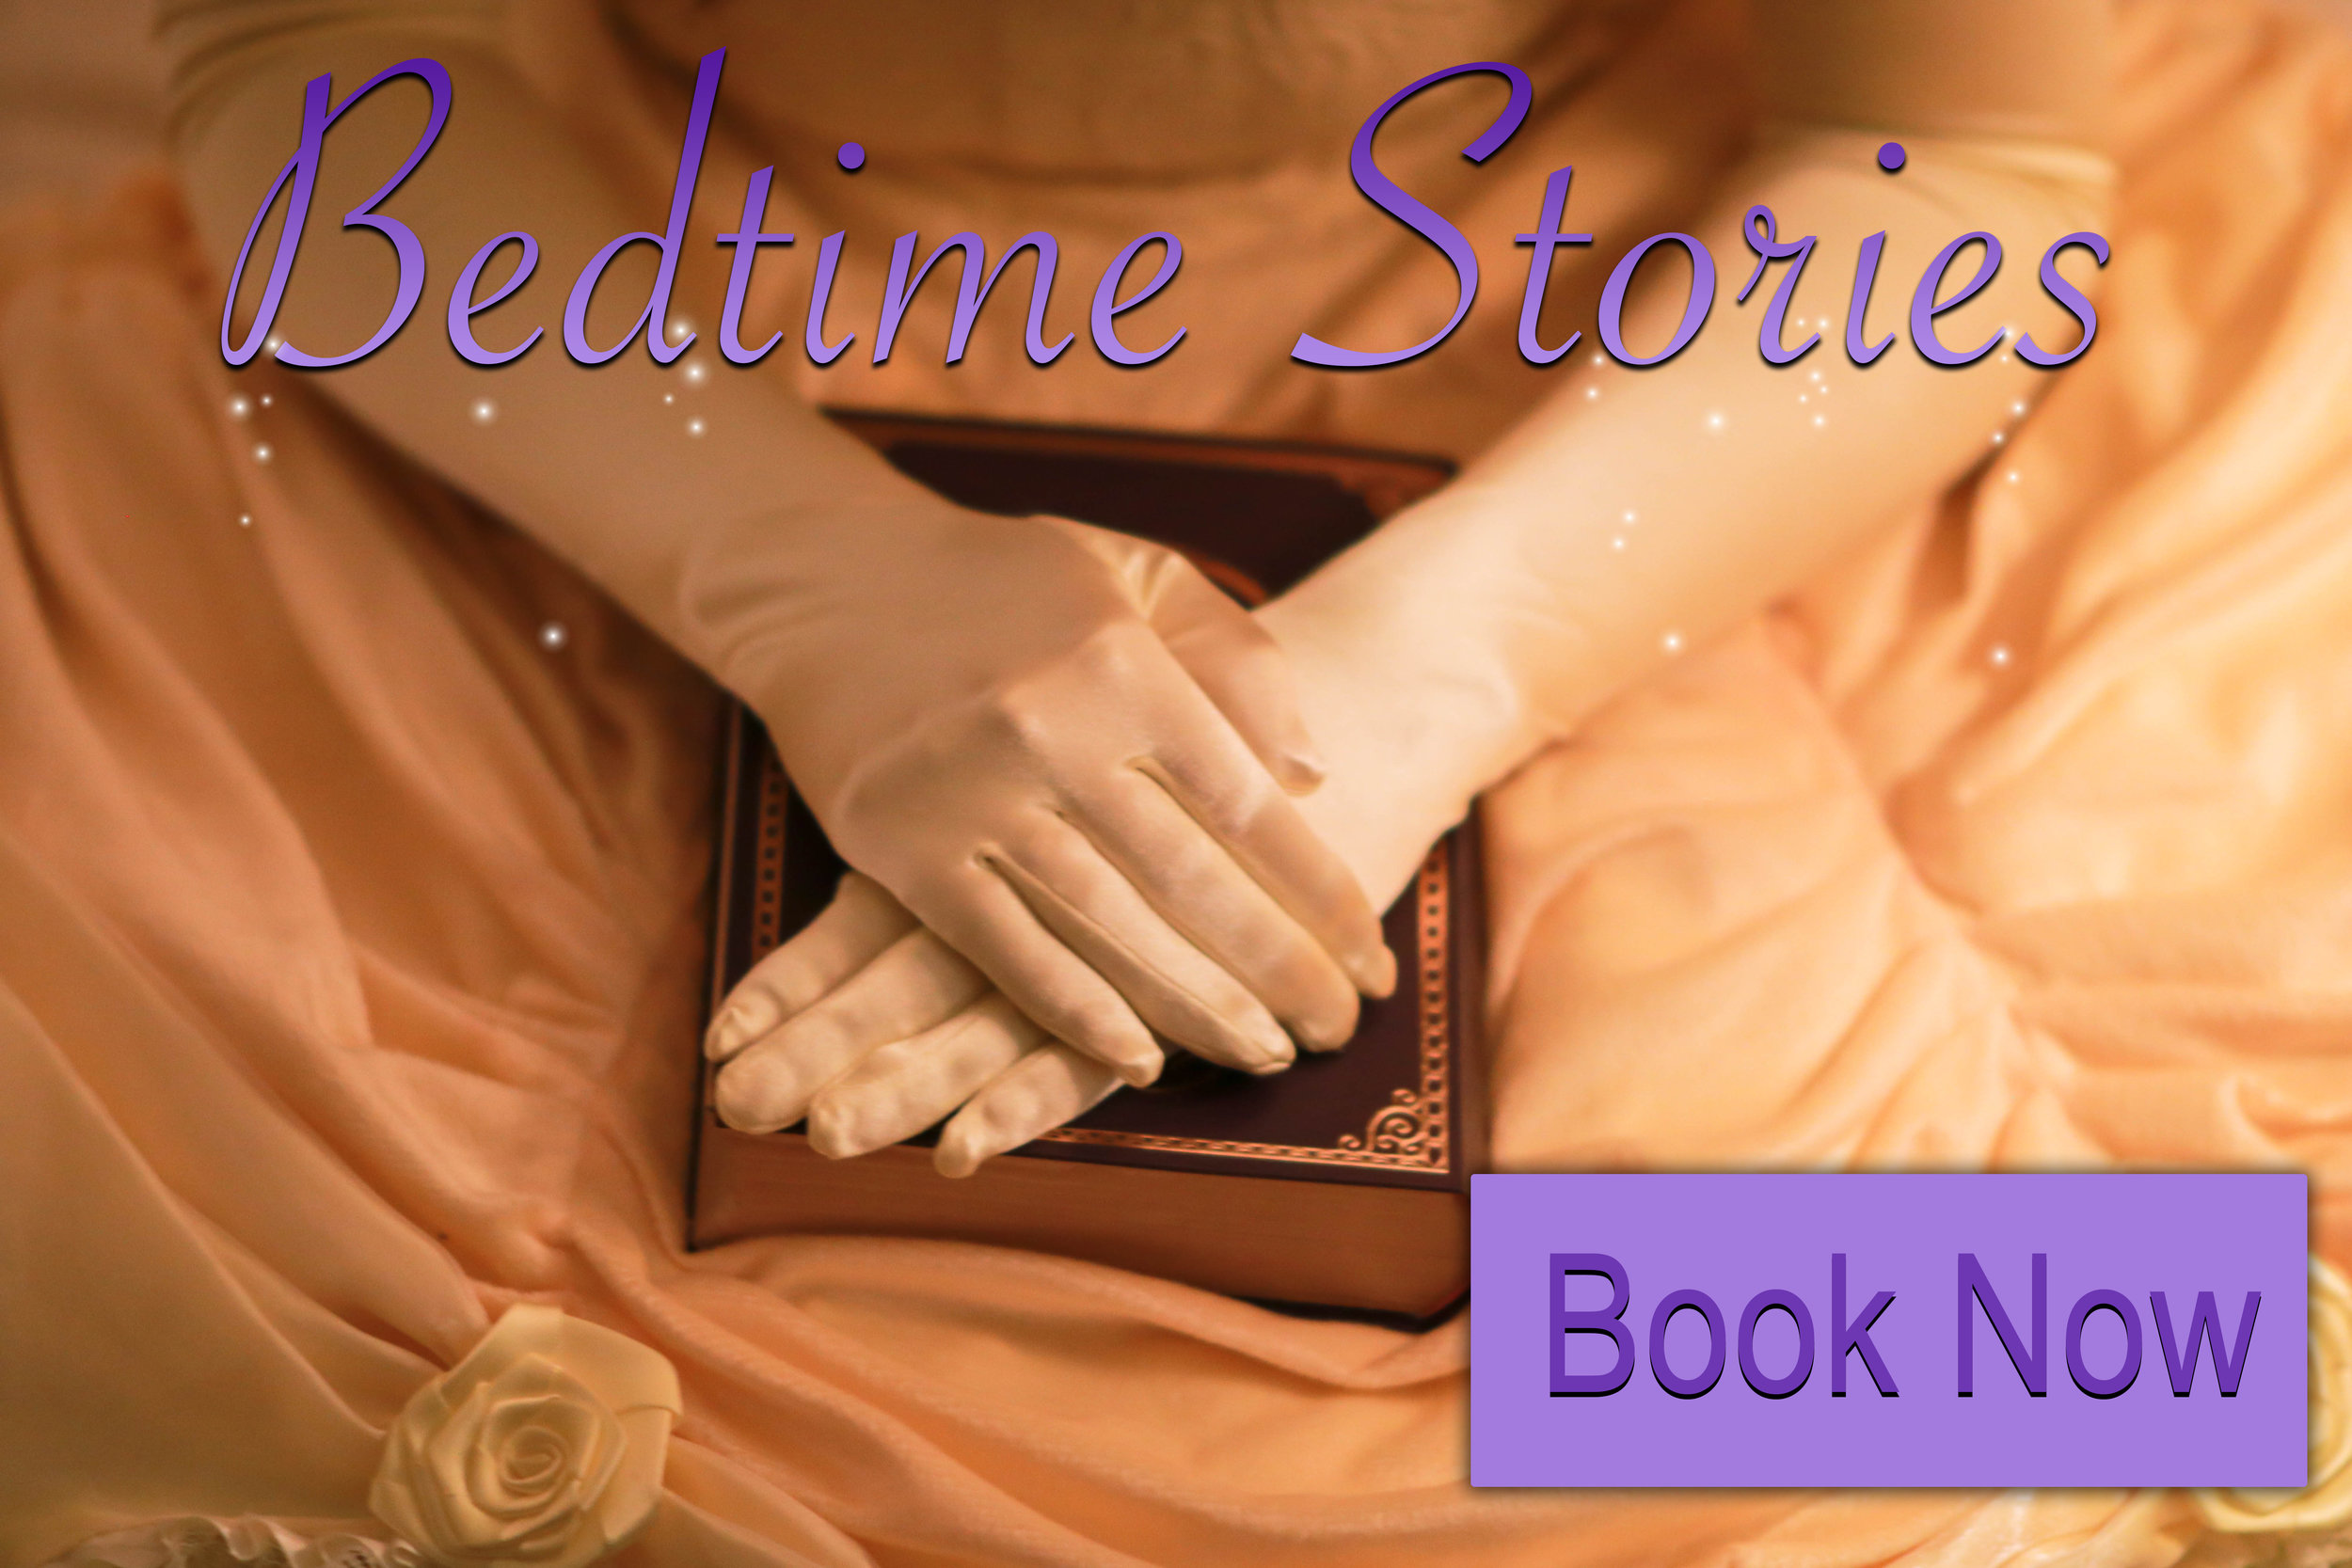 bedtime stories book now.jpg